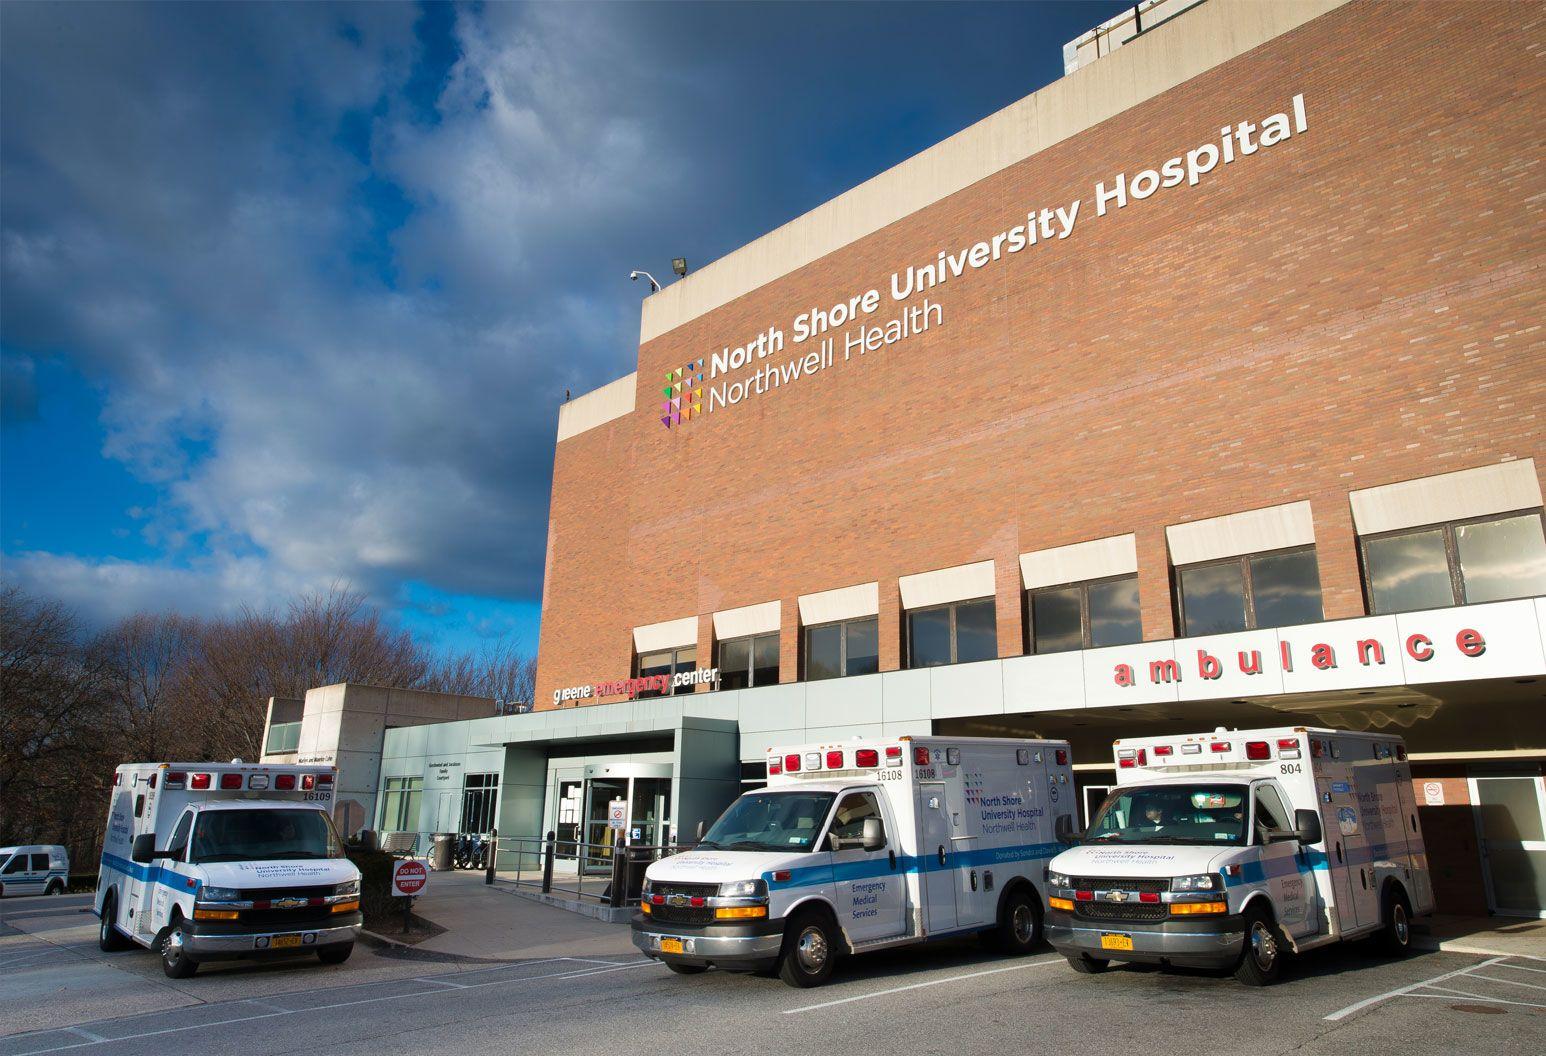 Emergency Department - North Shore University Hospital